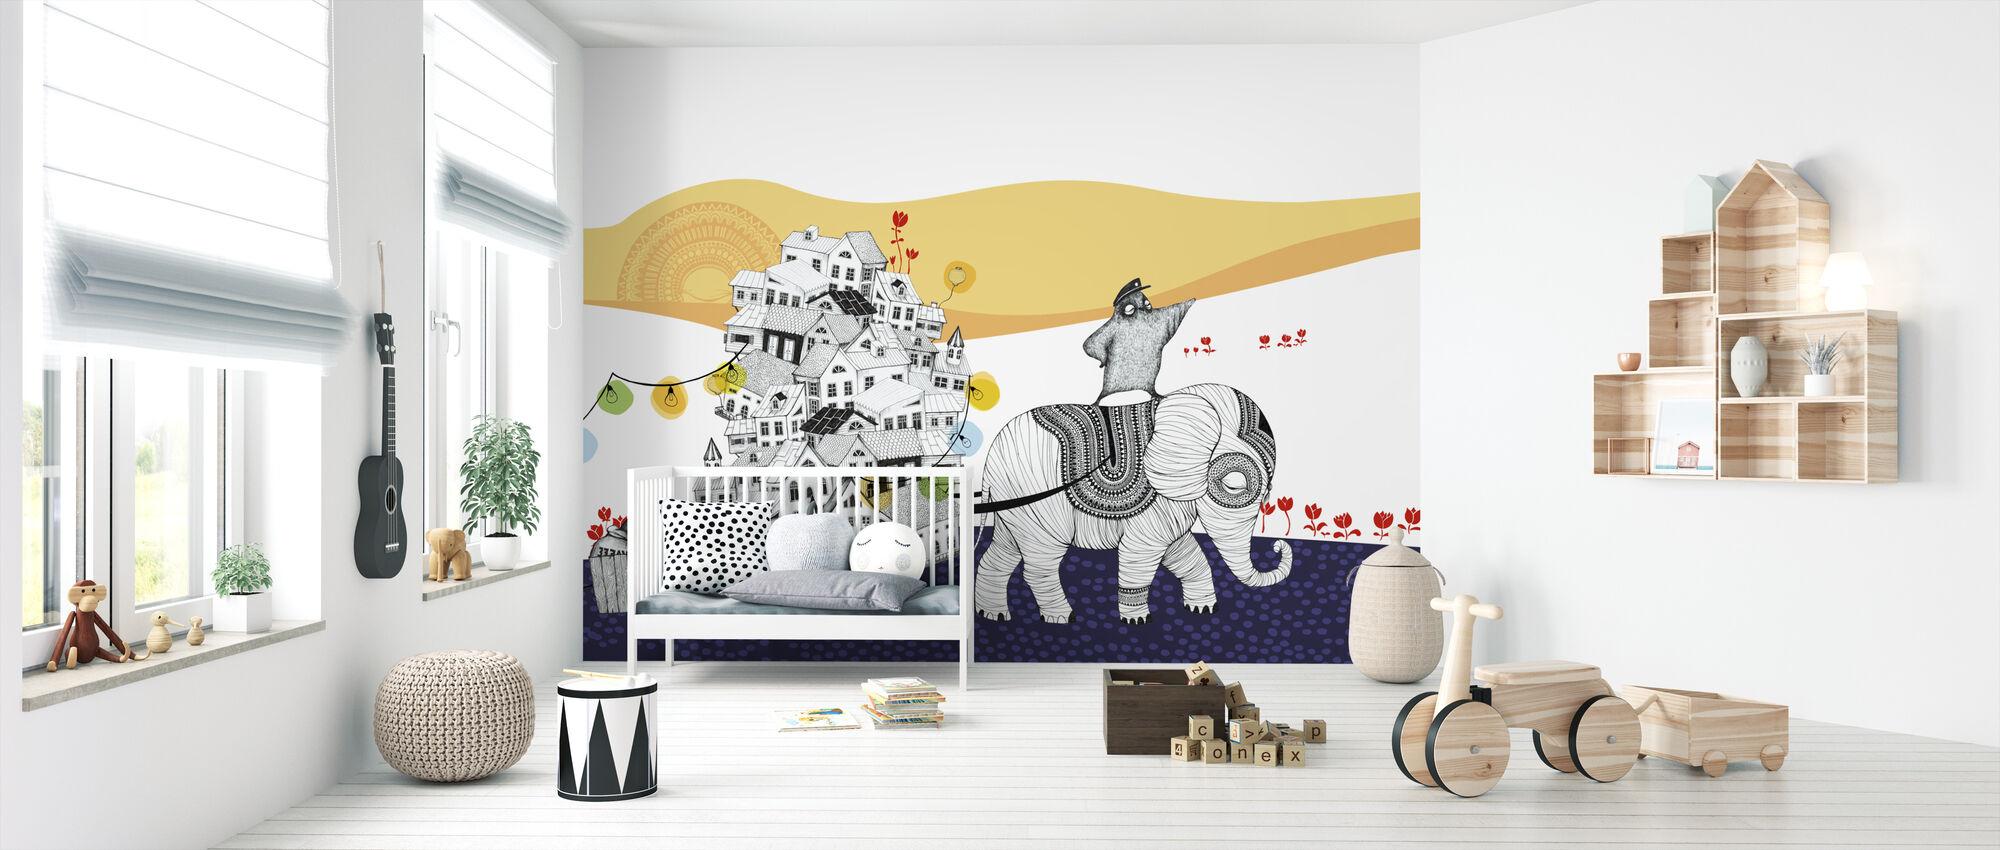 Hornstull norsu - Tapetti - Vauvan huone